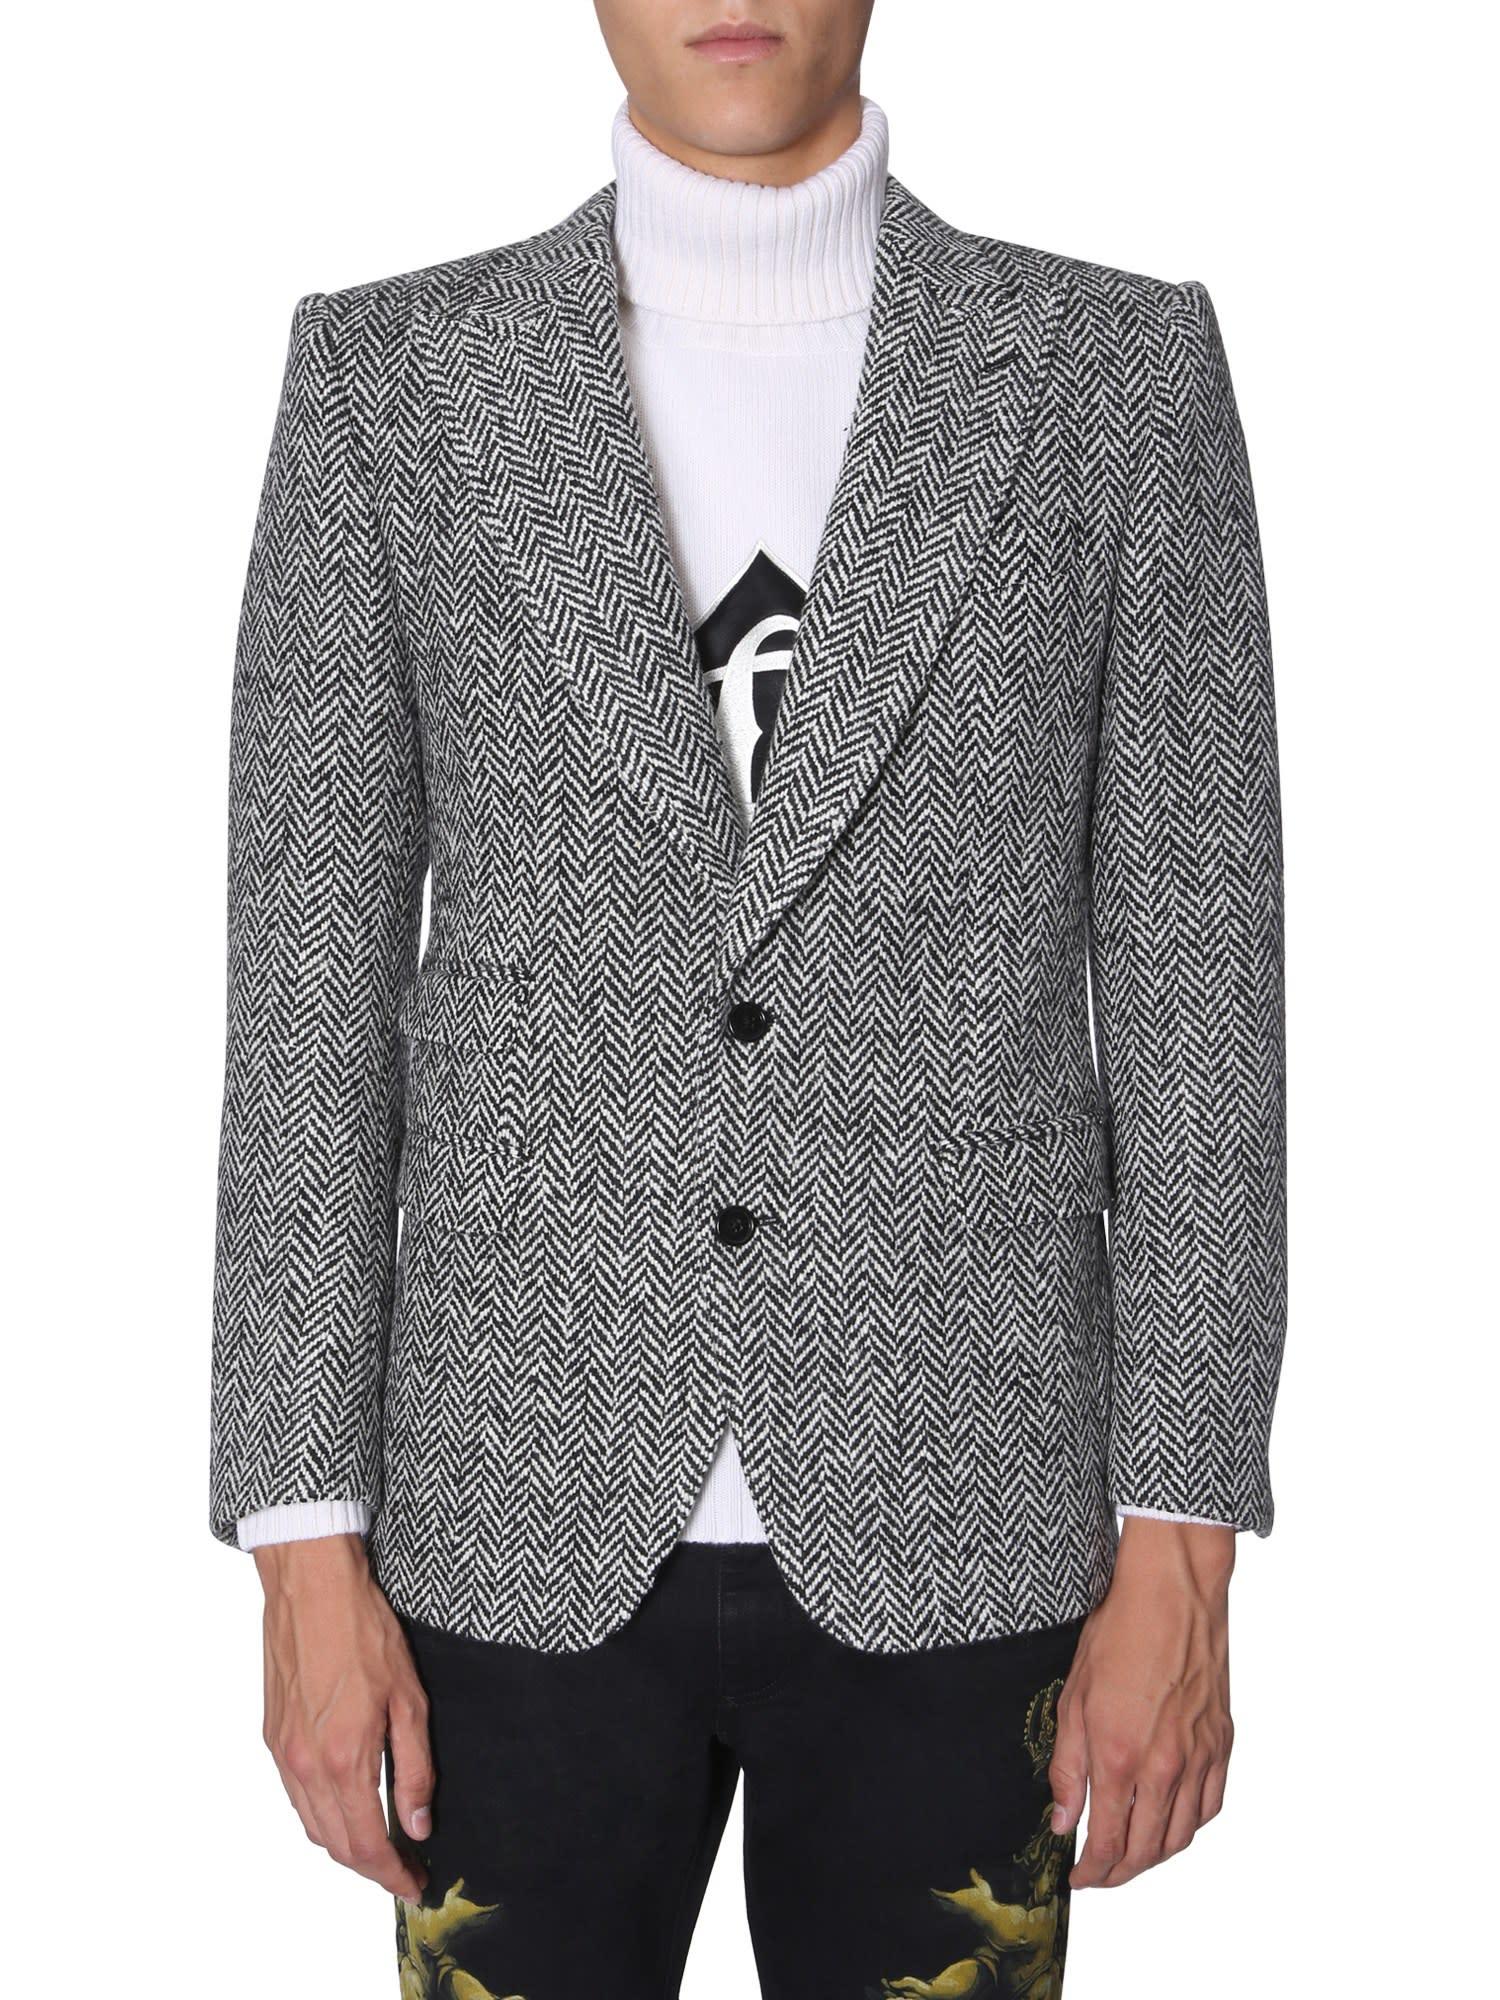 Dolce & Gabbana Two Buttons Herringbone Jacket